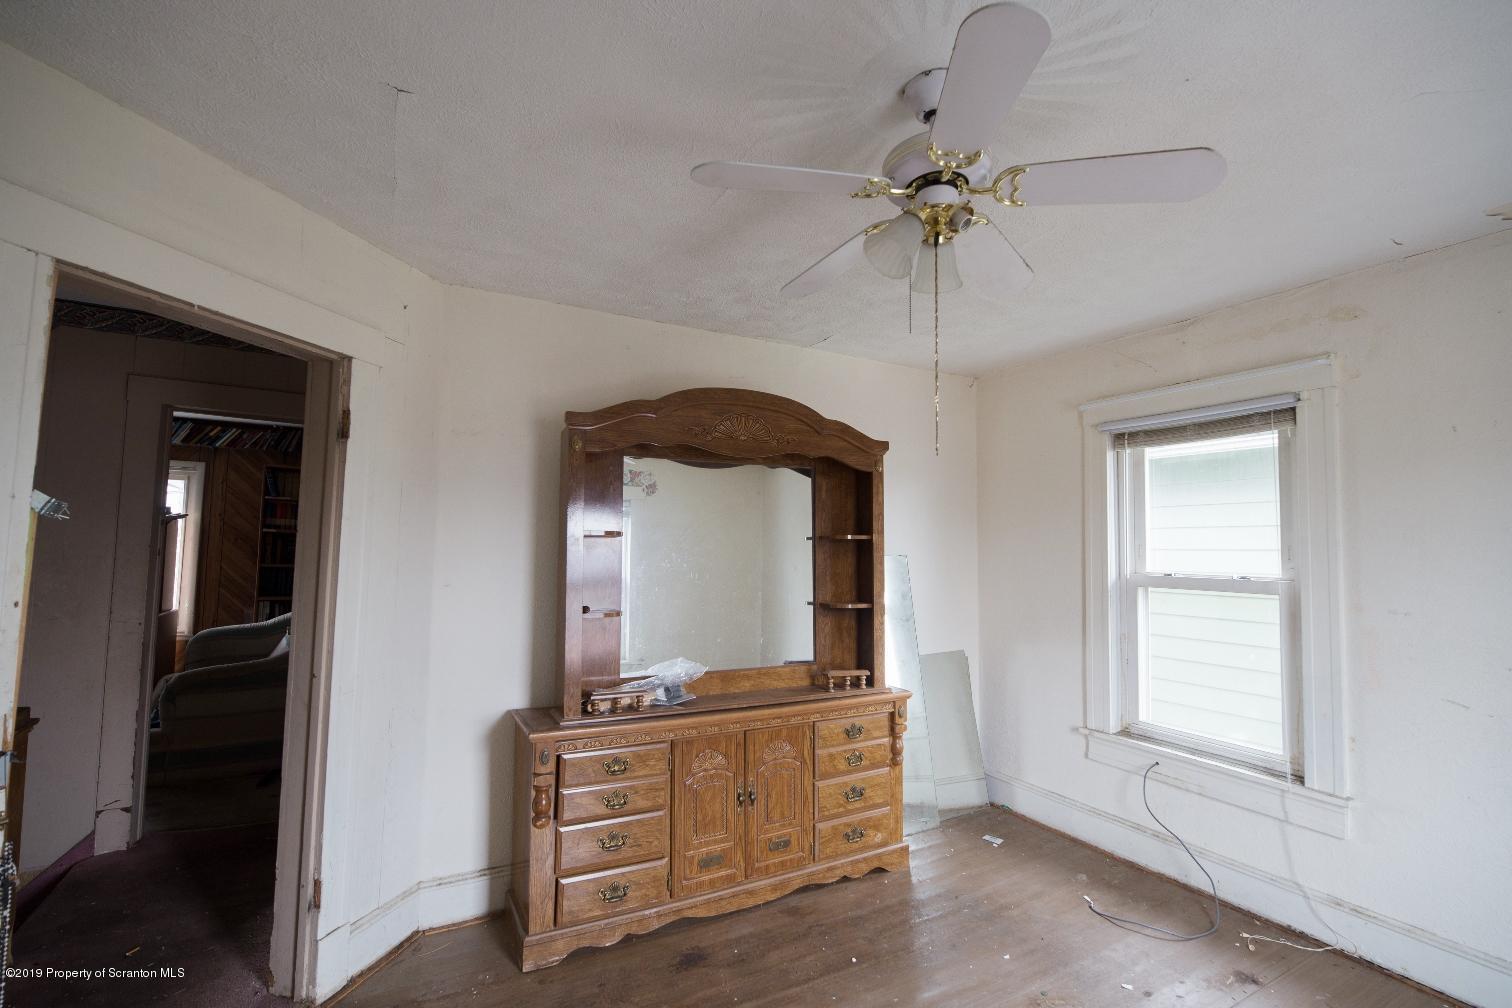 935 Madison Ave, Scranton, Pennsylvania 18510, 3 Bedrooms Bedrooms, 6 Rooms Rooms,1 BathroomBathrooms,Single Family,For Sale,Madison,19-2178